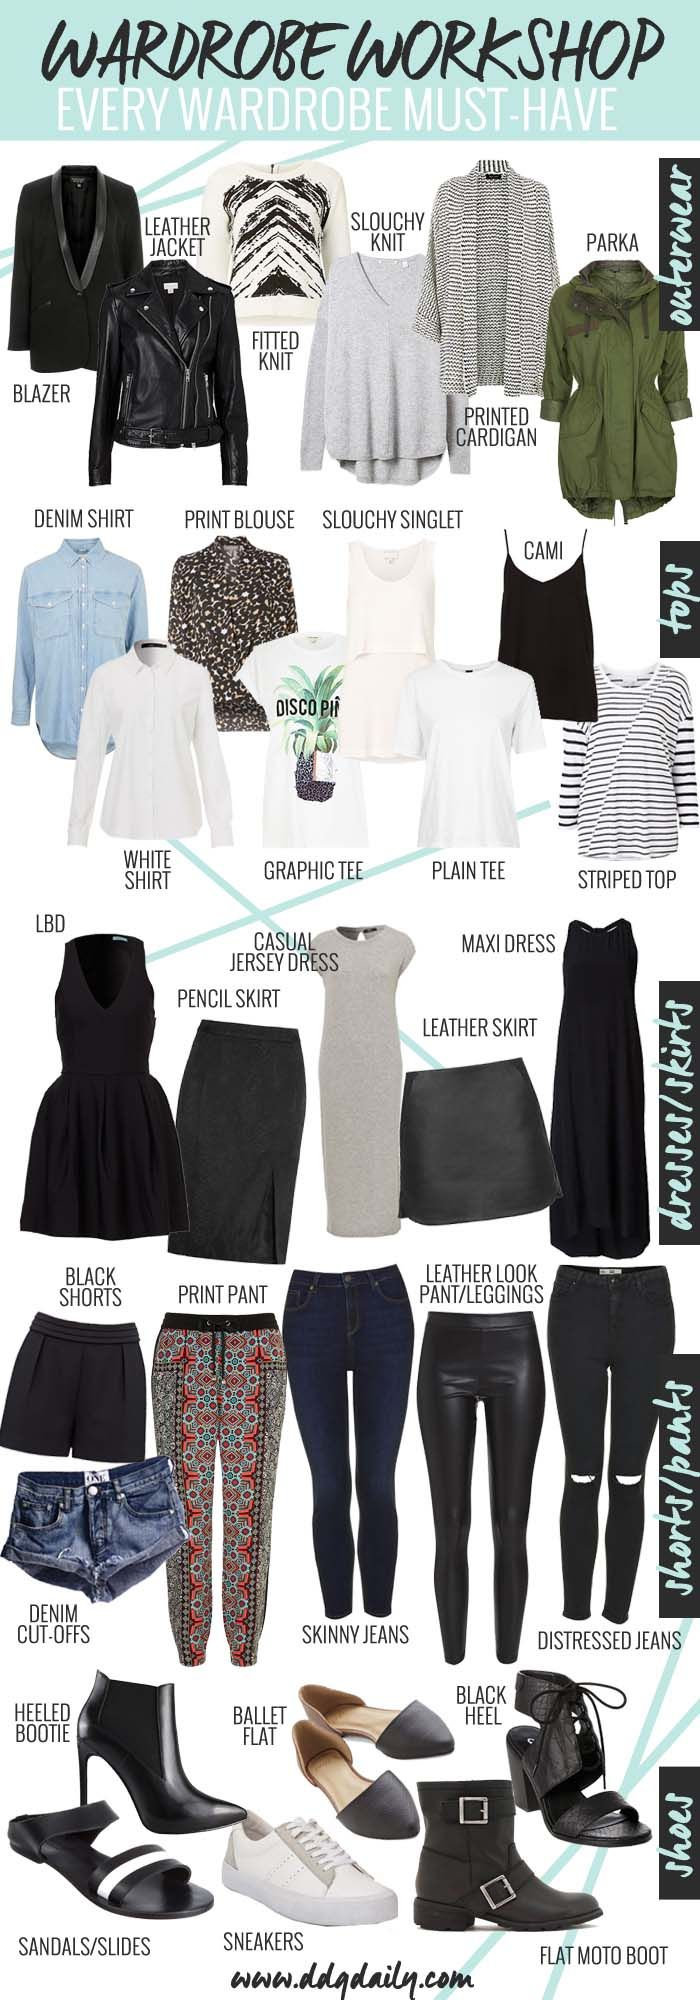 wardrobeworkshop_f15